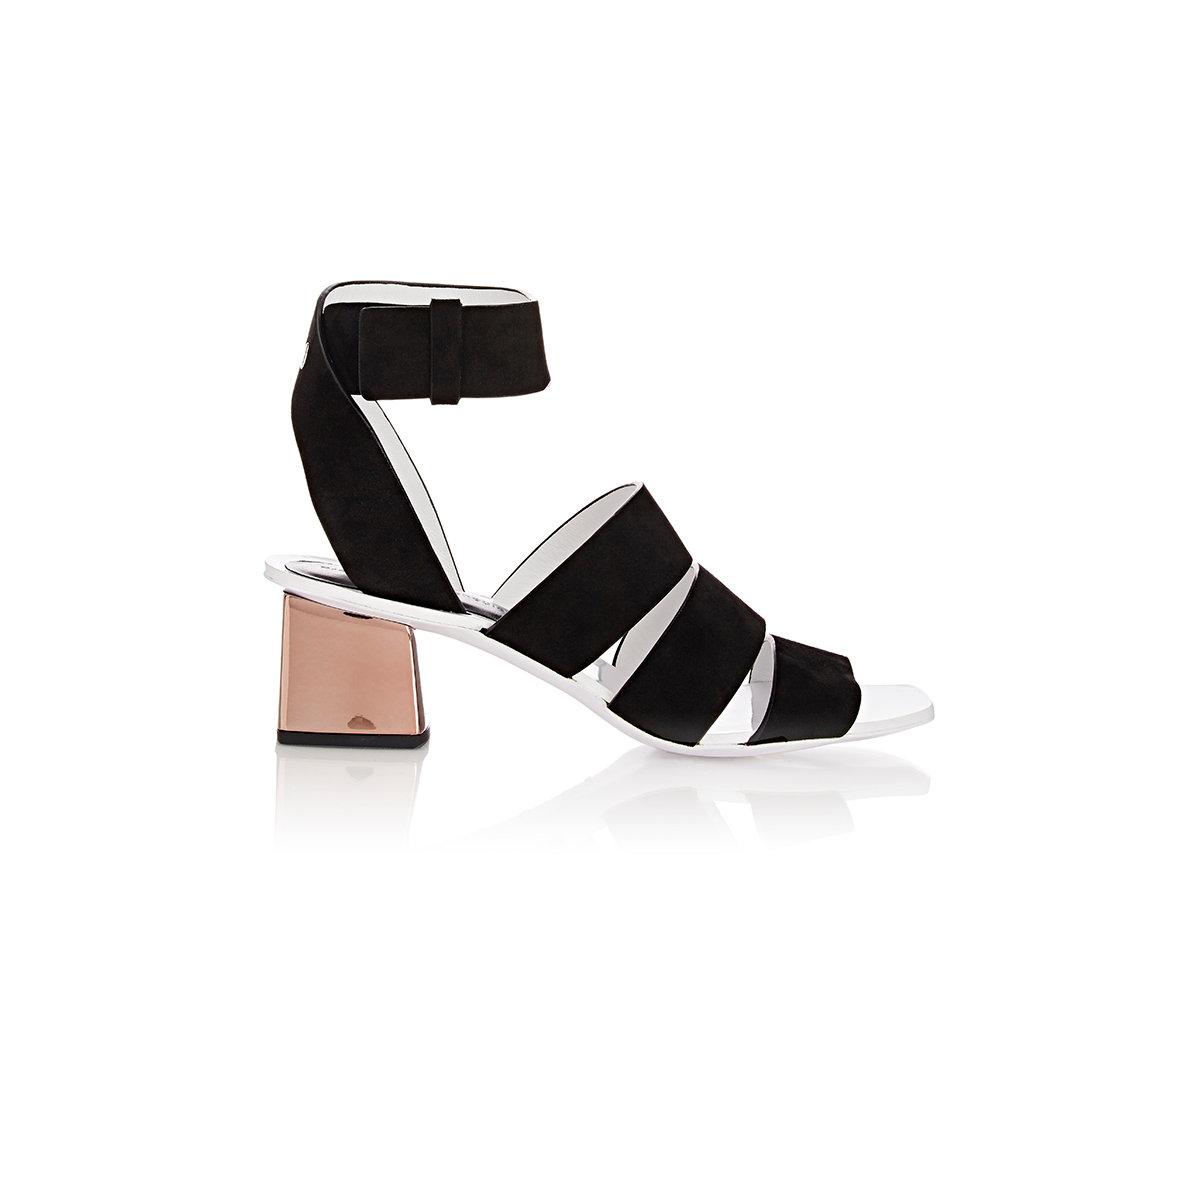 4e9650c58e9dfb Proenza Schouler Women s Metal-heel Multi-strap Sandals in Black - Lyst